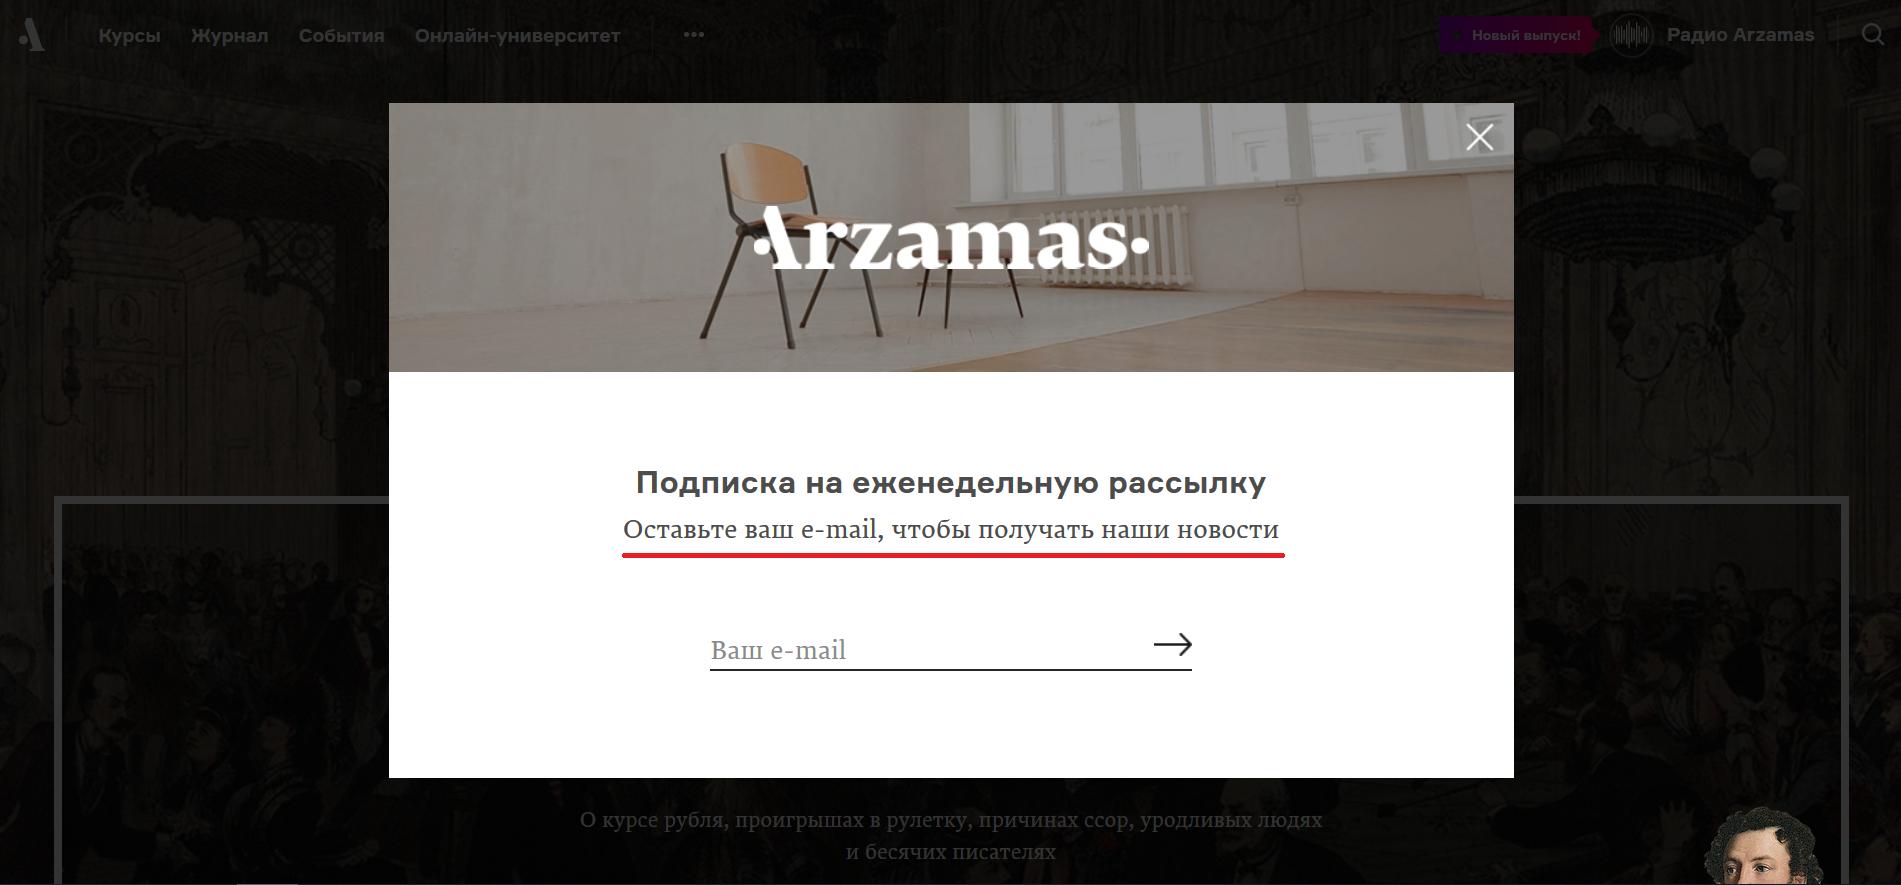 Форма подписки Arzamas